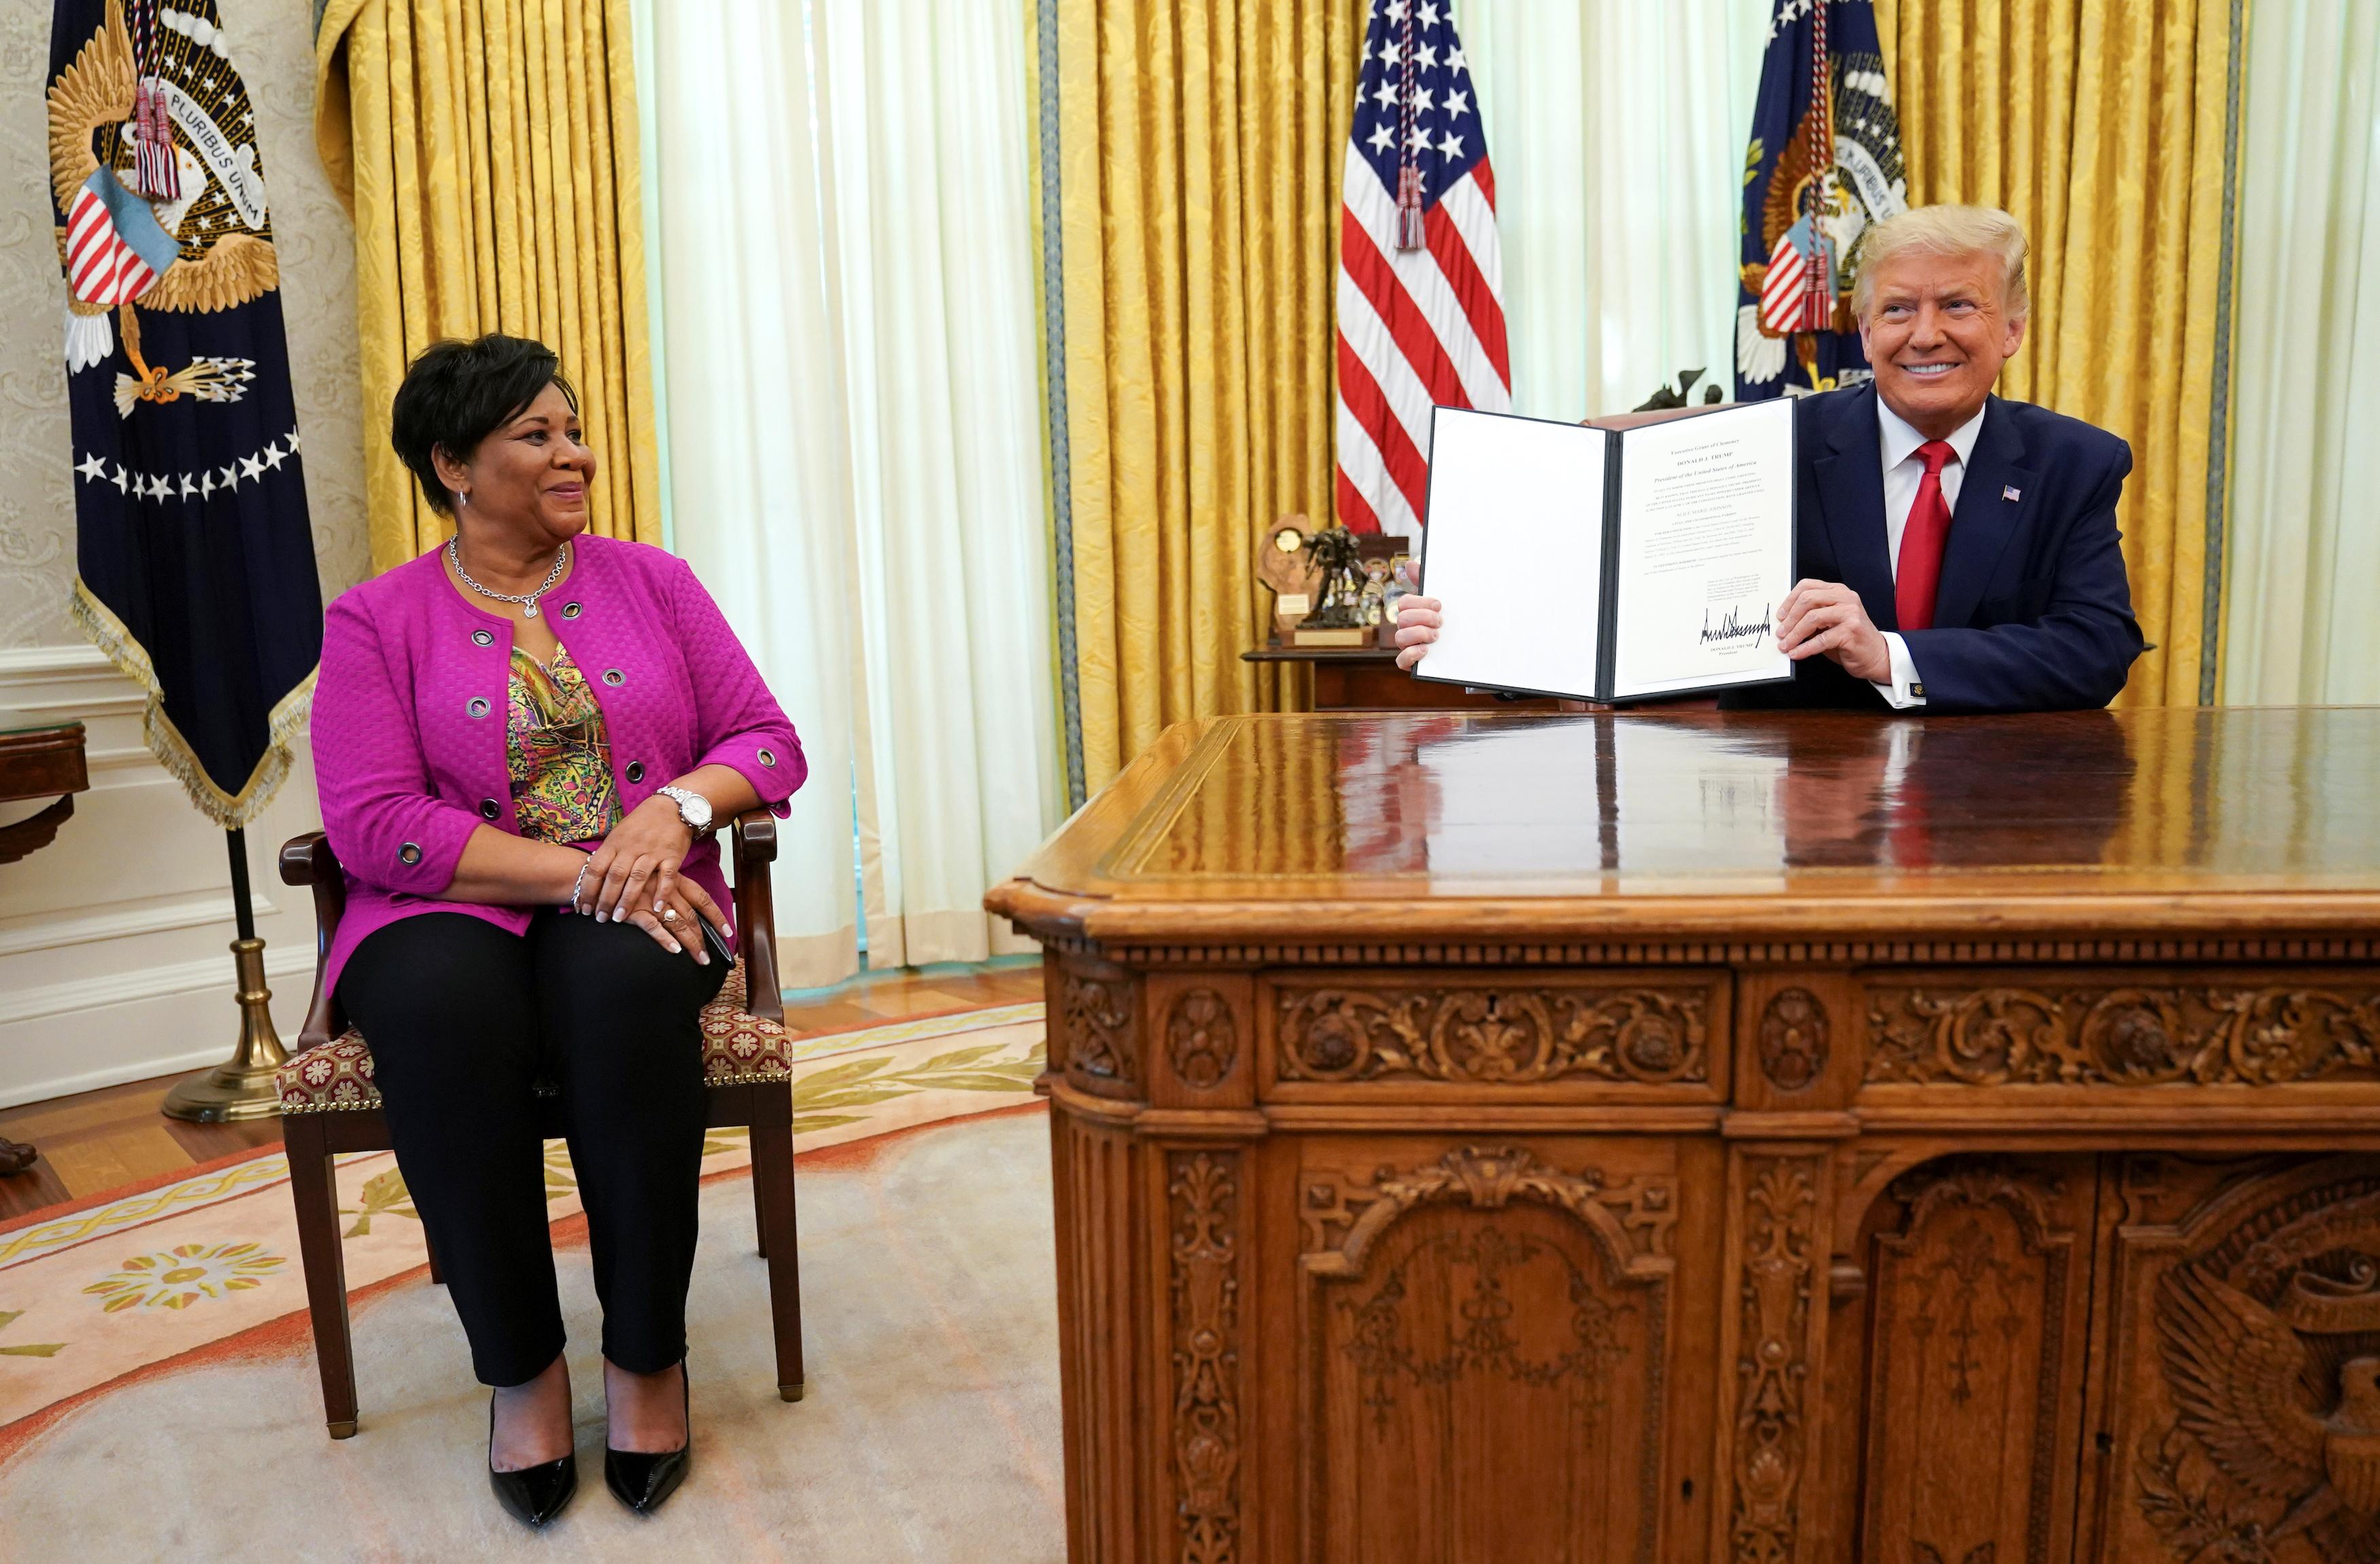 Trump pardons Alice Johnson at the White House in Washington